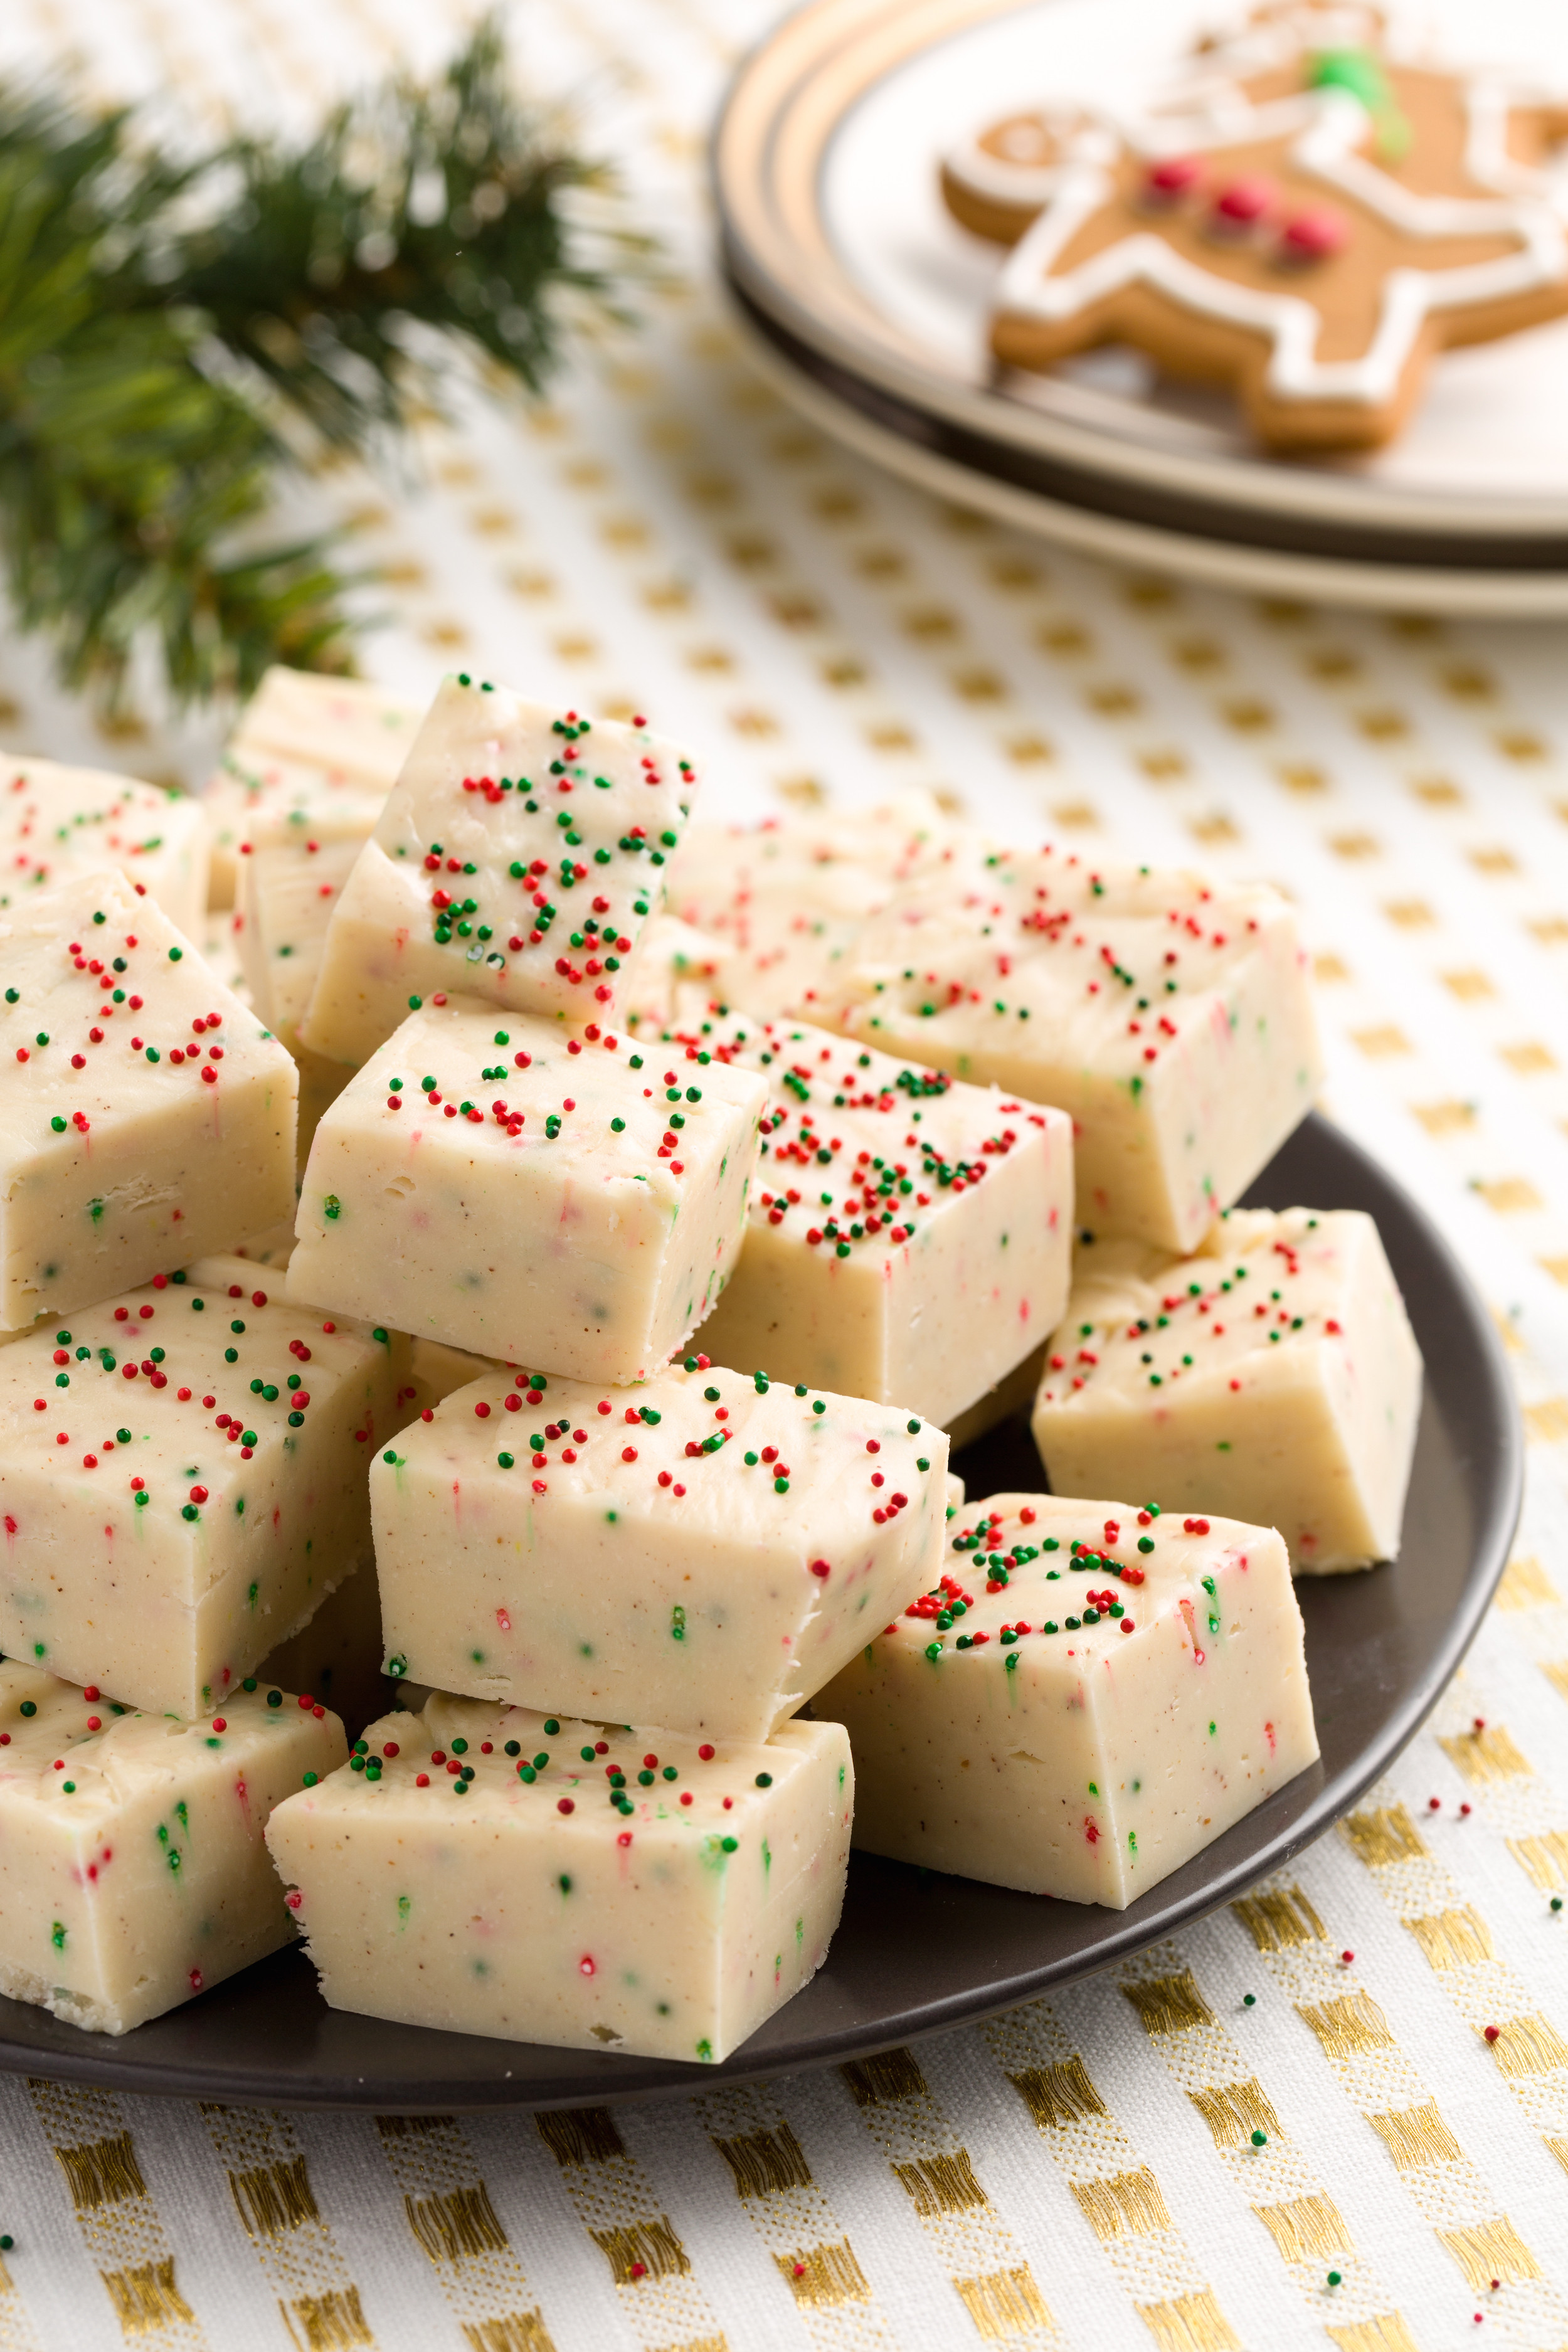 Candy Recipes For Christmas  18 Easy Homemade Christmas Candy Recipes How To Make